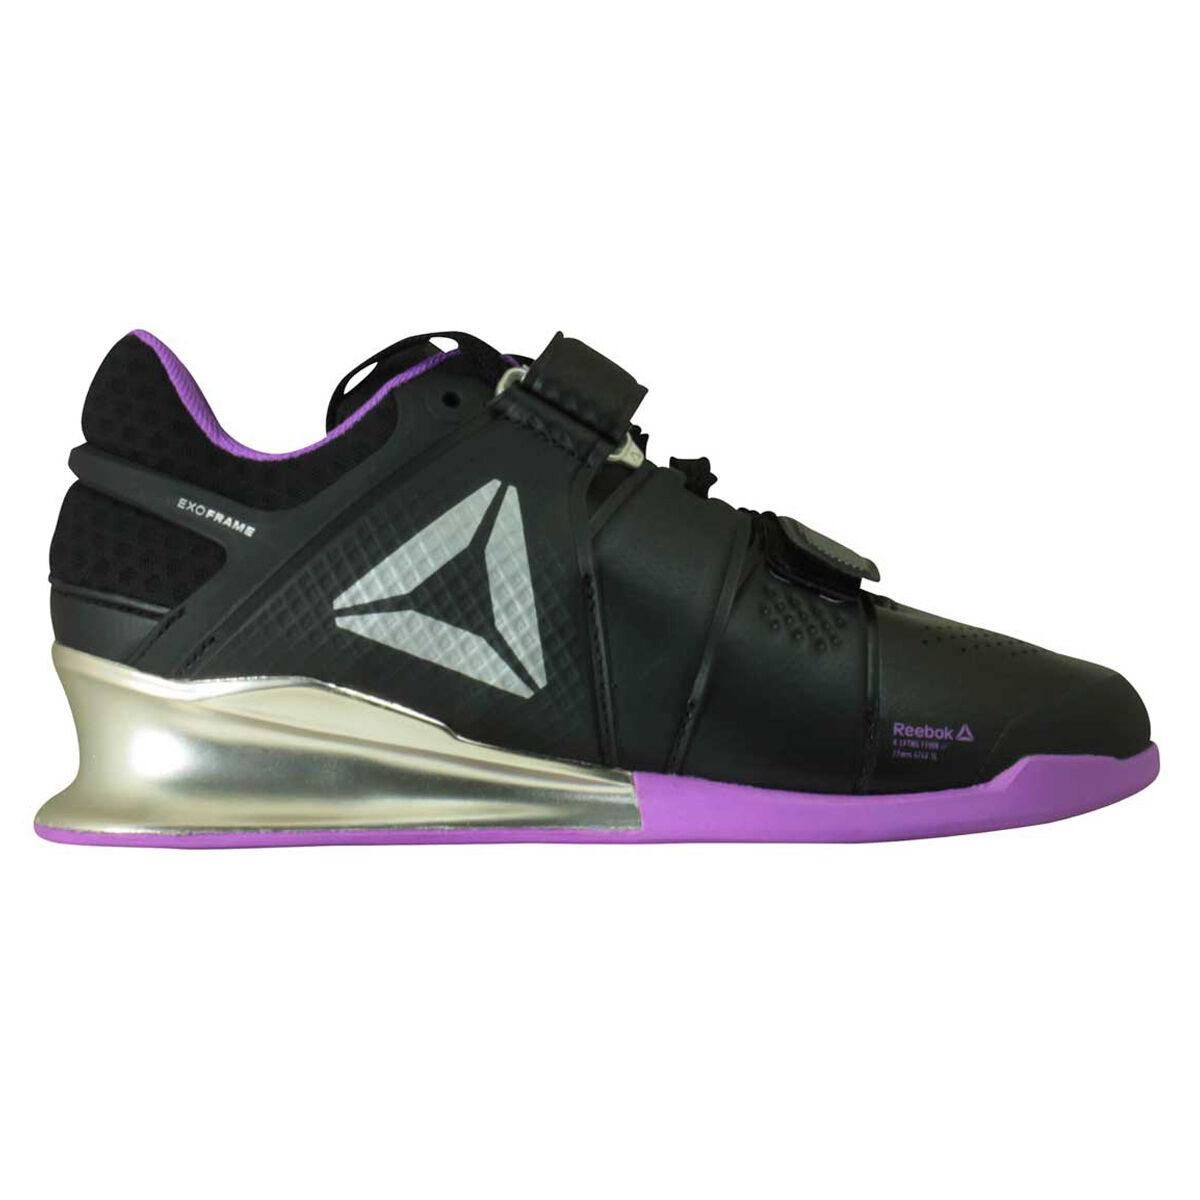 Reebok Legacy Lifter Women's Training Shoes AW19